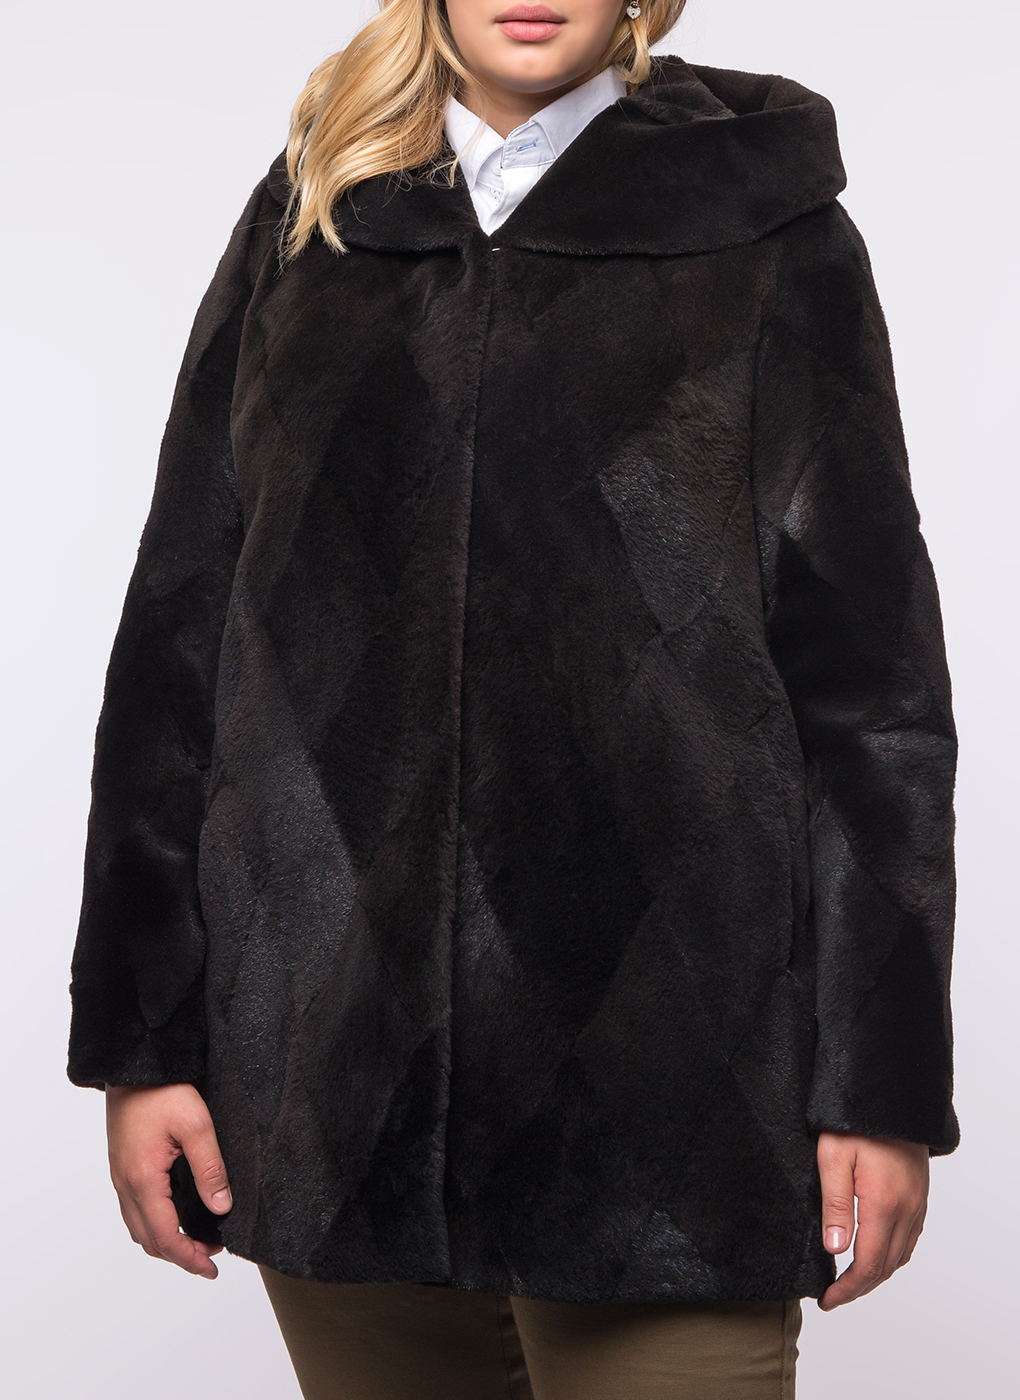 Куртка из нутрии Автоледи 02, Karolina babayan фото